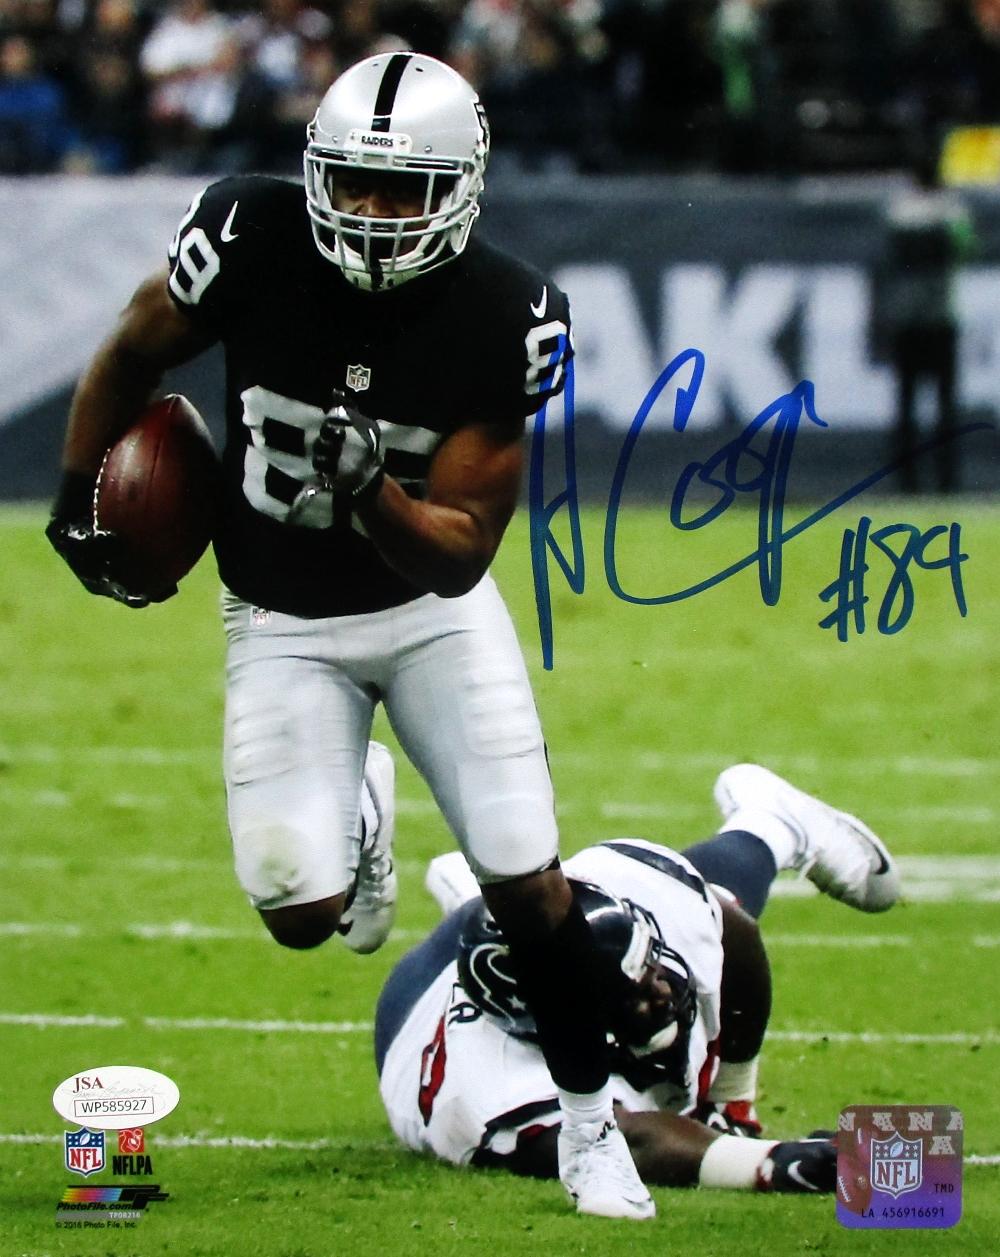 a7a3a389b99 Amari Cooper Signed Oakland Raiders 8x10 Running Photo JSA ITP